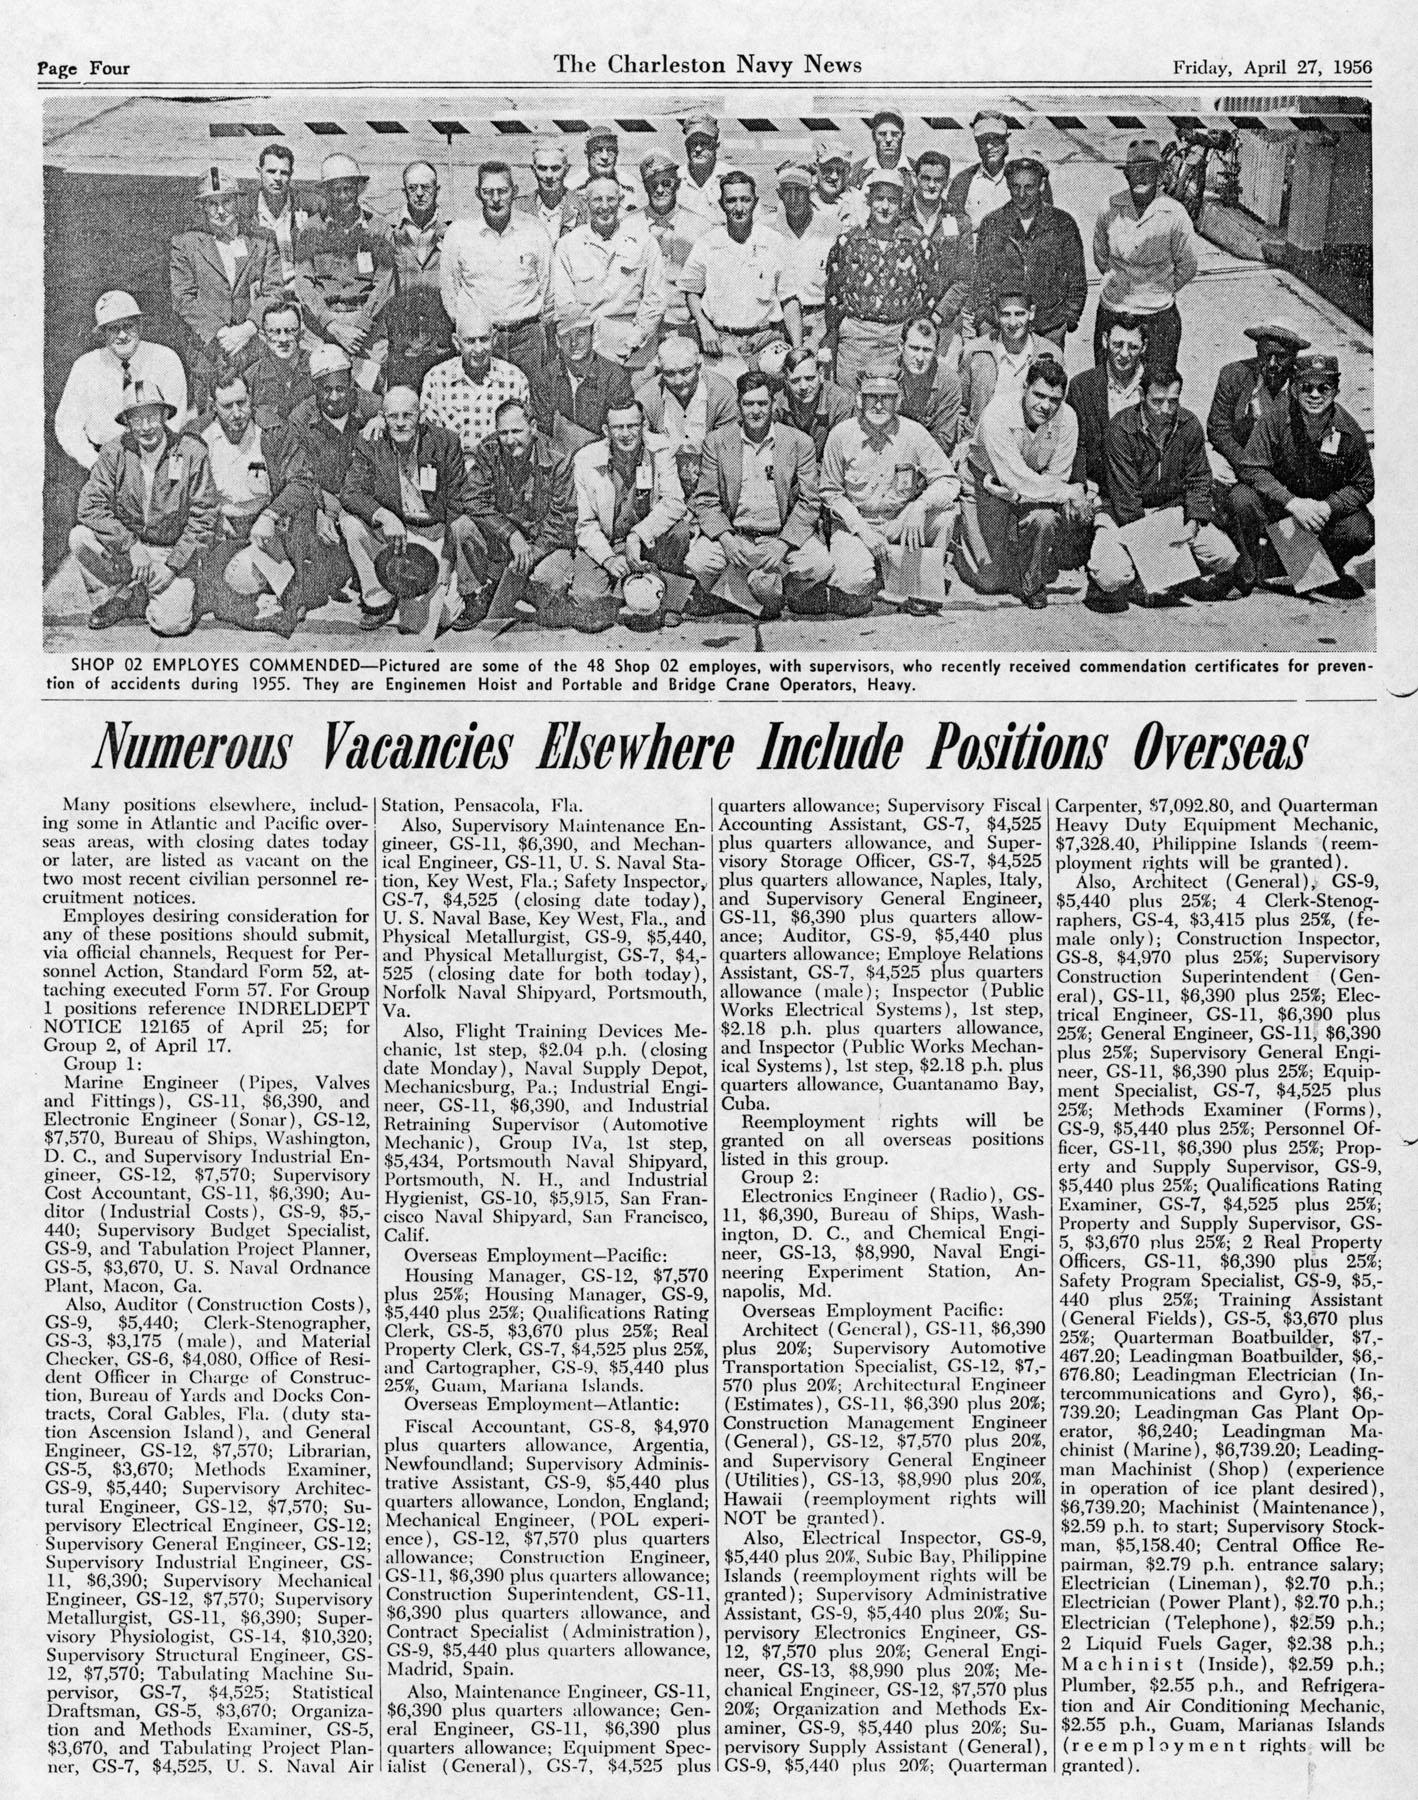 The Charleston Navy News, Volume 14, Edition 20, page iv